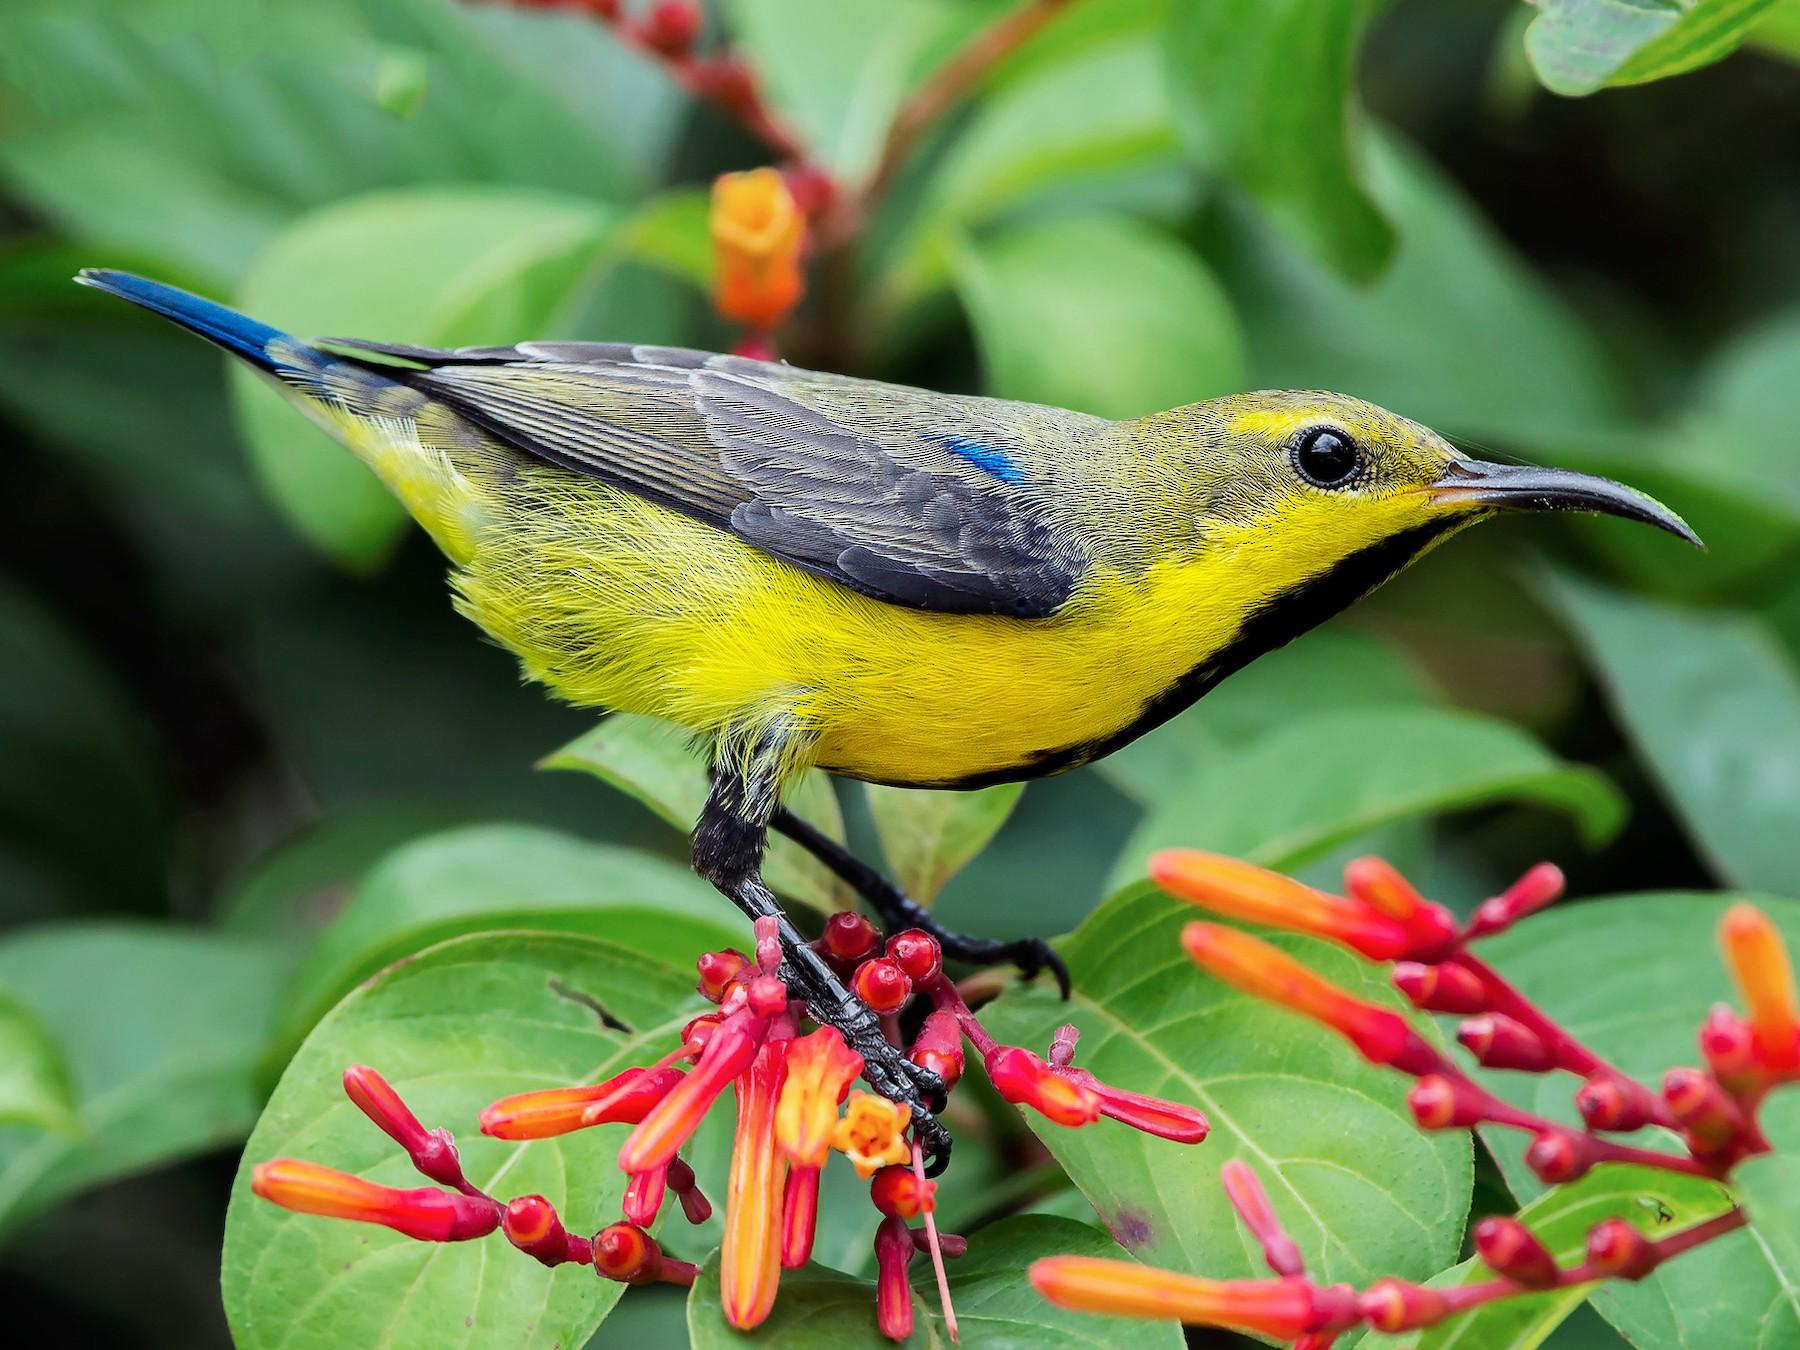 Purple Sunbird - Natthaphat Chotjuckdikul